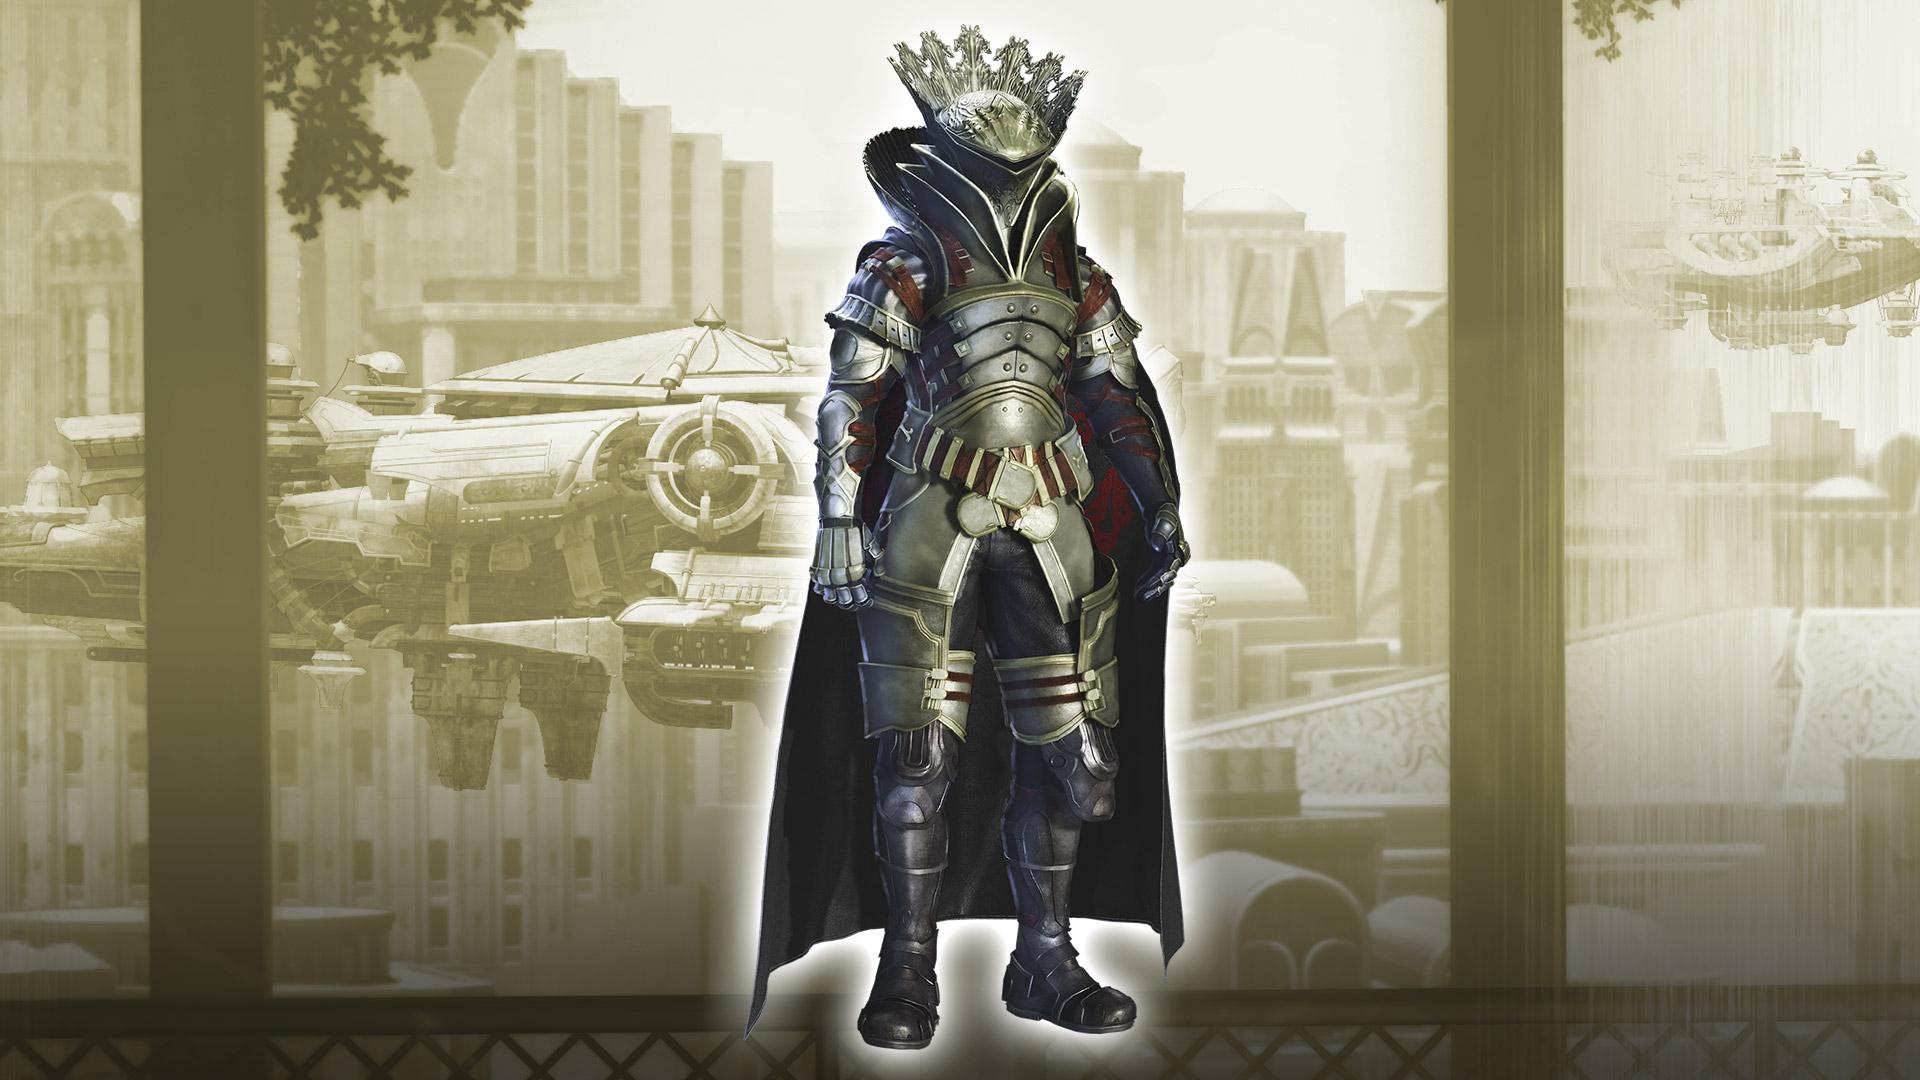 Final Fantasy Xii The Zodiac Age Wallpaper 009 Judge Bergan